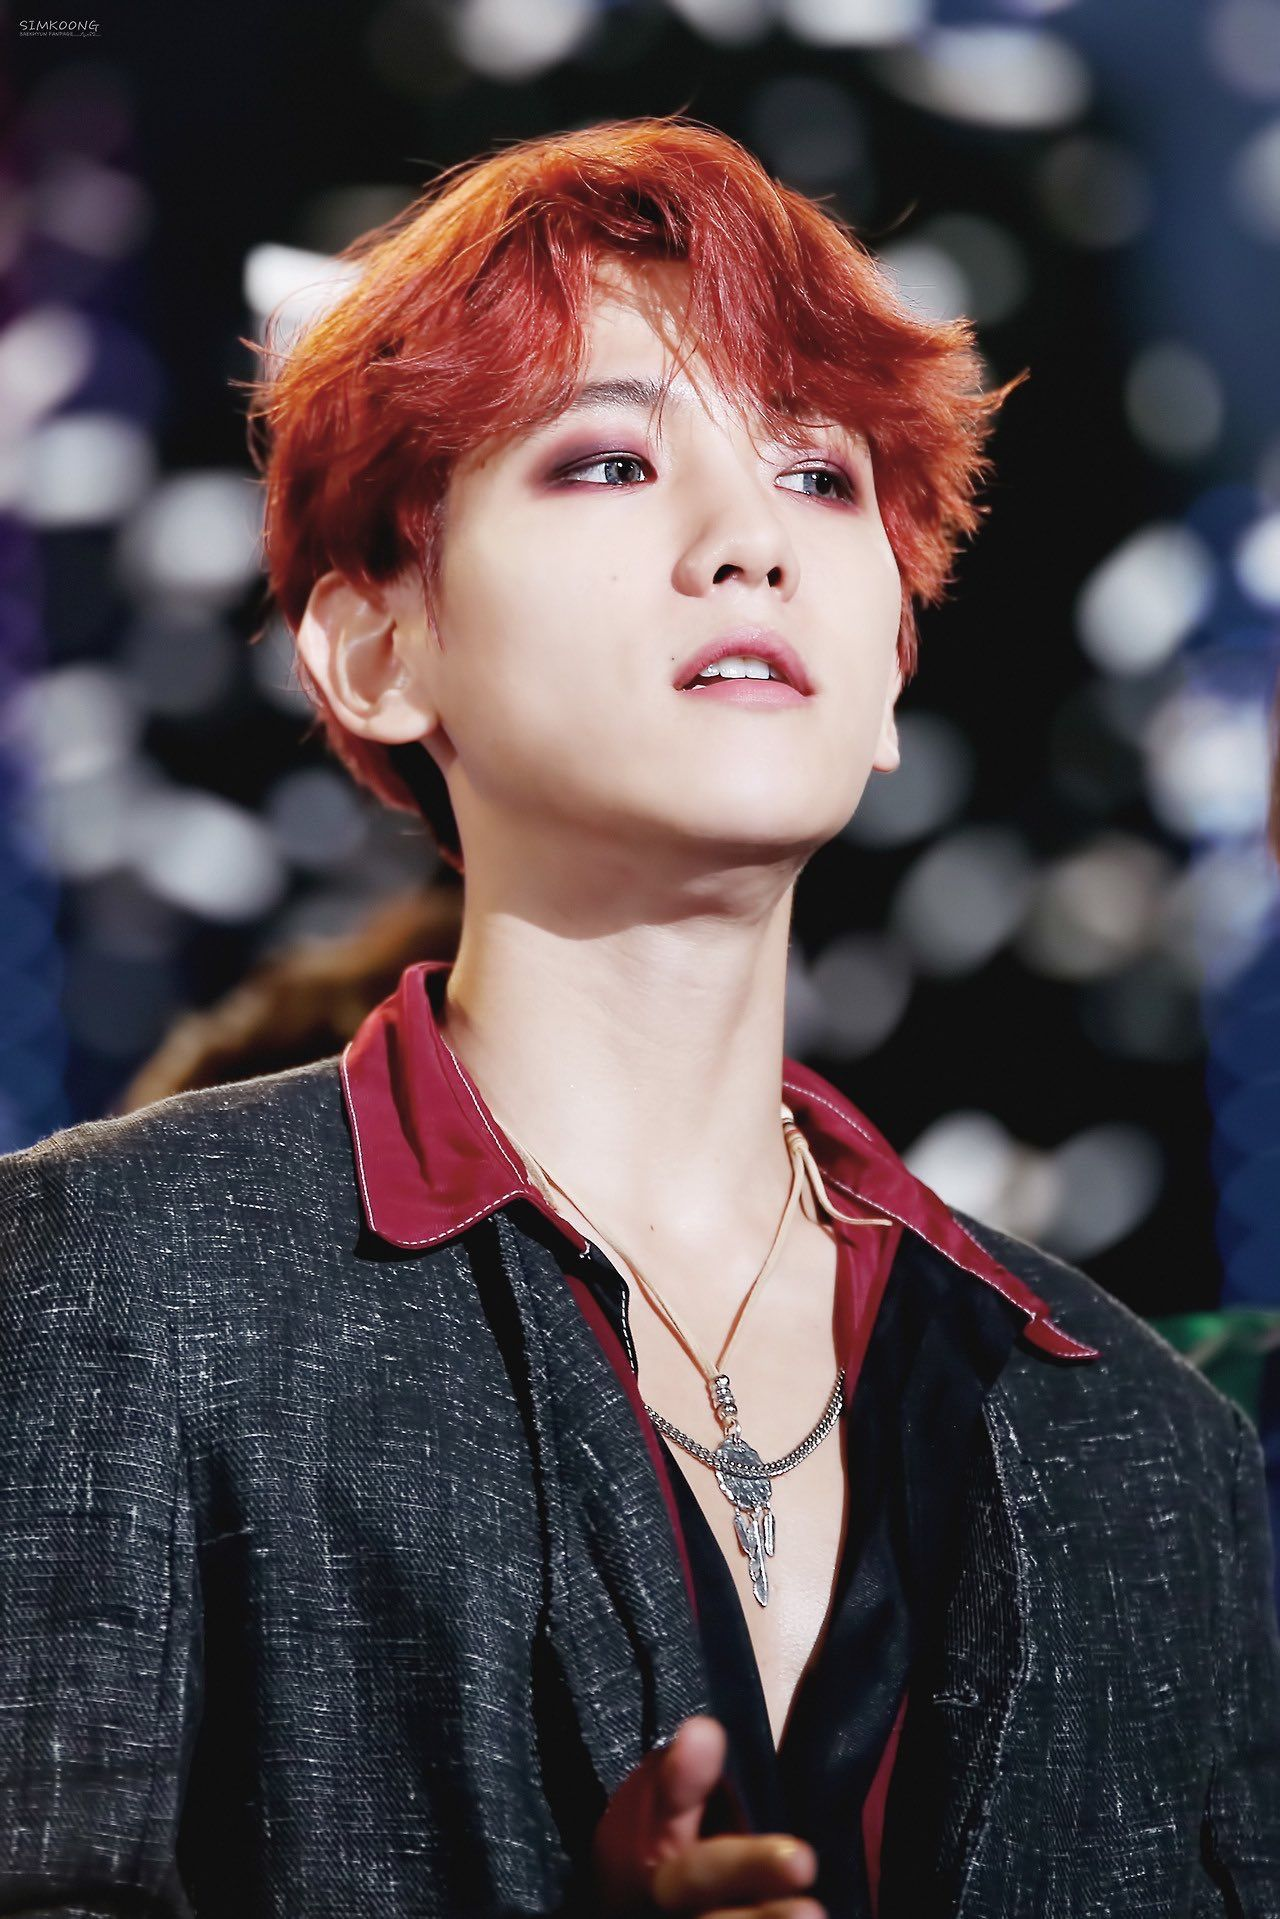 Baekhyun Hq 161008 At Dmc Festival 2016 Mbc Korean Music Wave Exo Suho K Idols Exo M